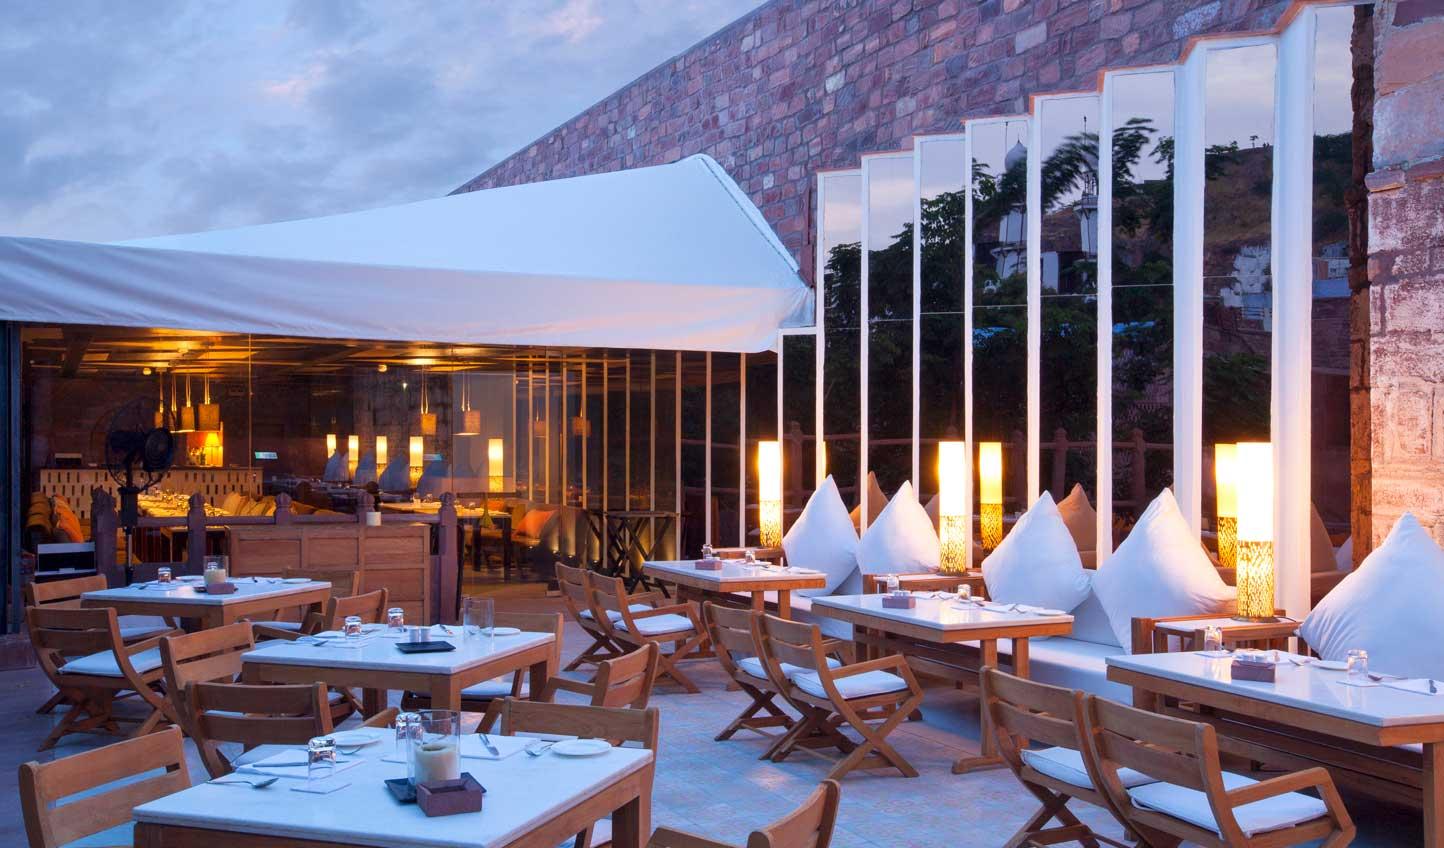 Dine beneath the stars in Jodhpur